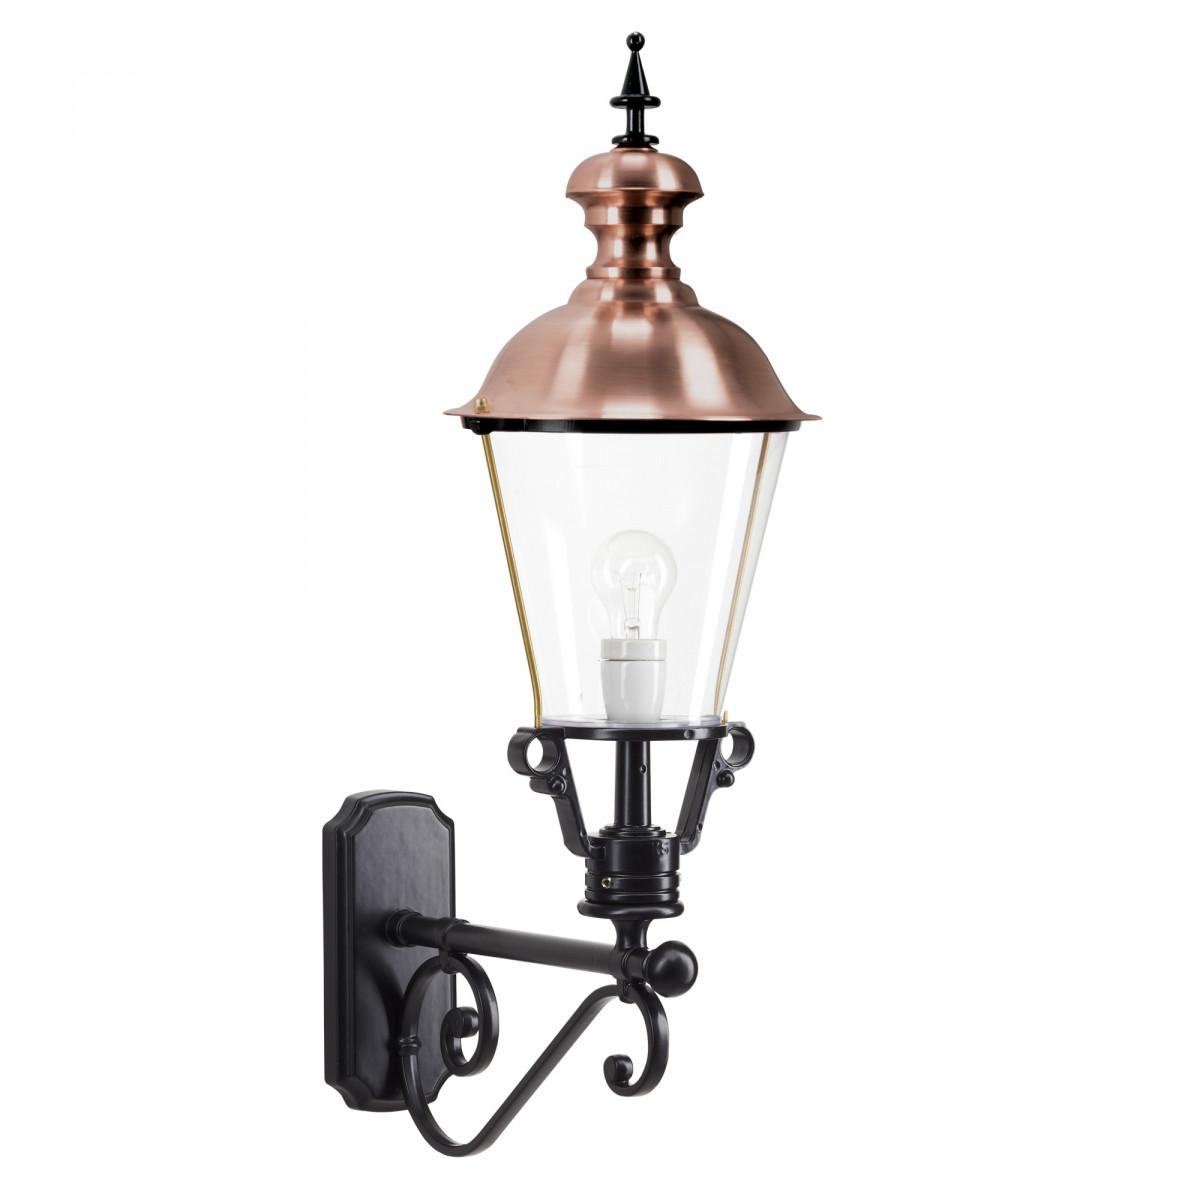 Exclusieve klassieke buitenlamp Notaris L